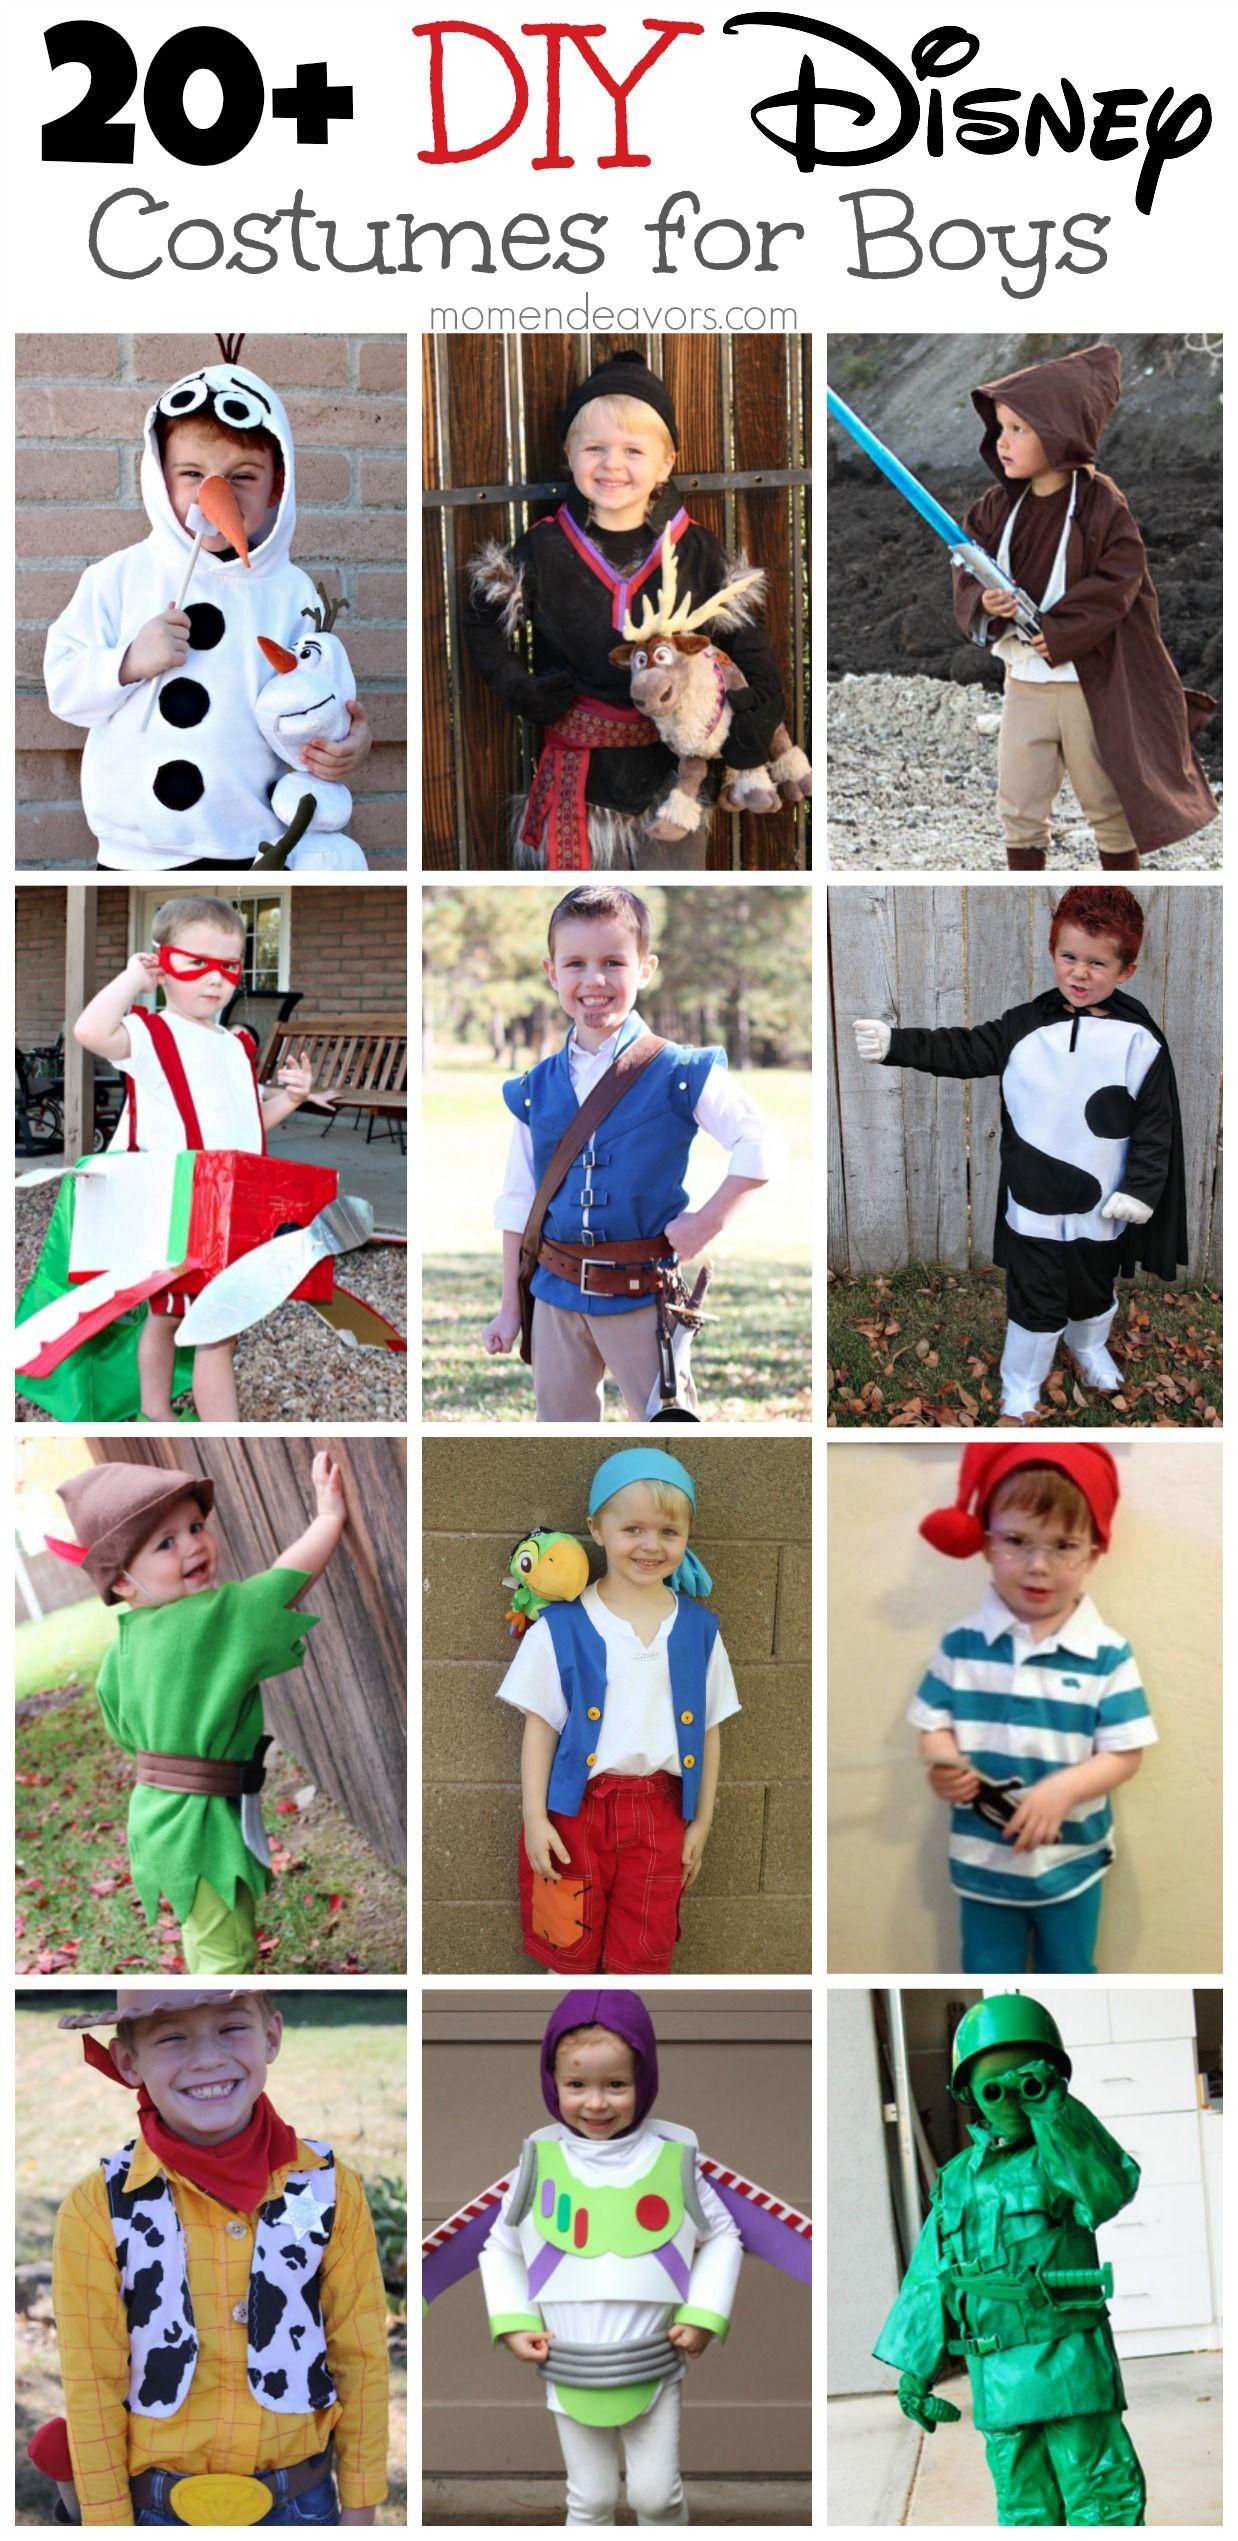 20+ DIY Disney Costumes for boys! So many great ideas